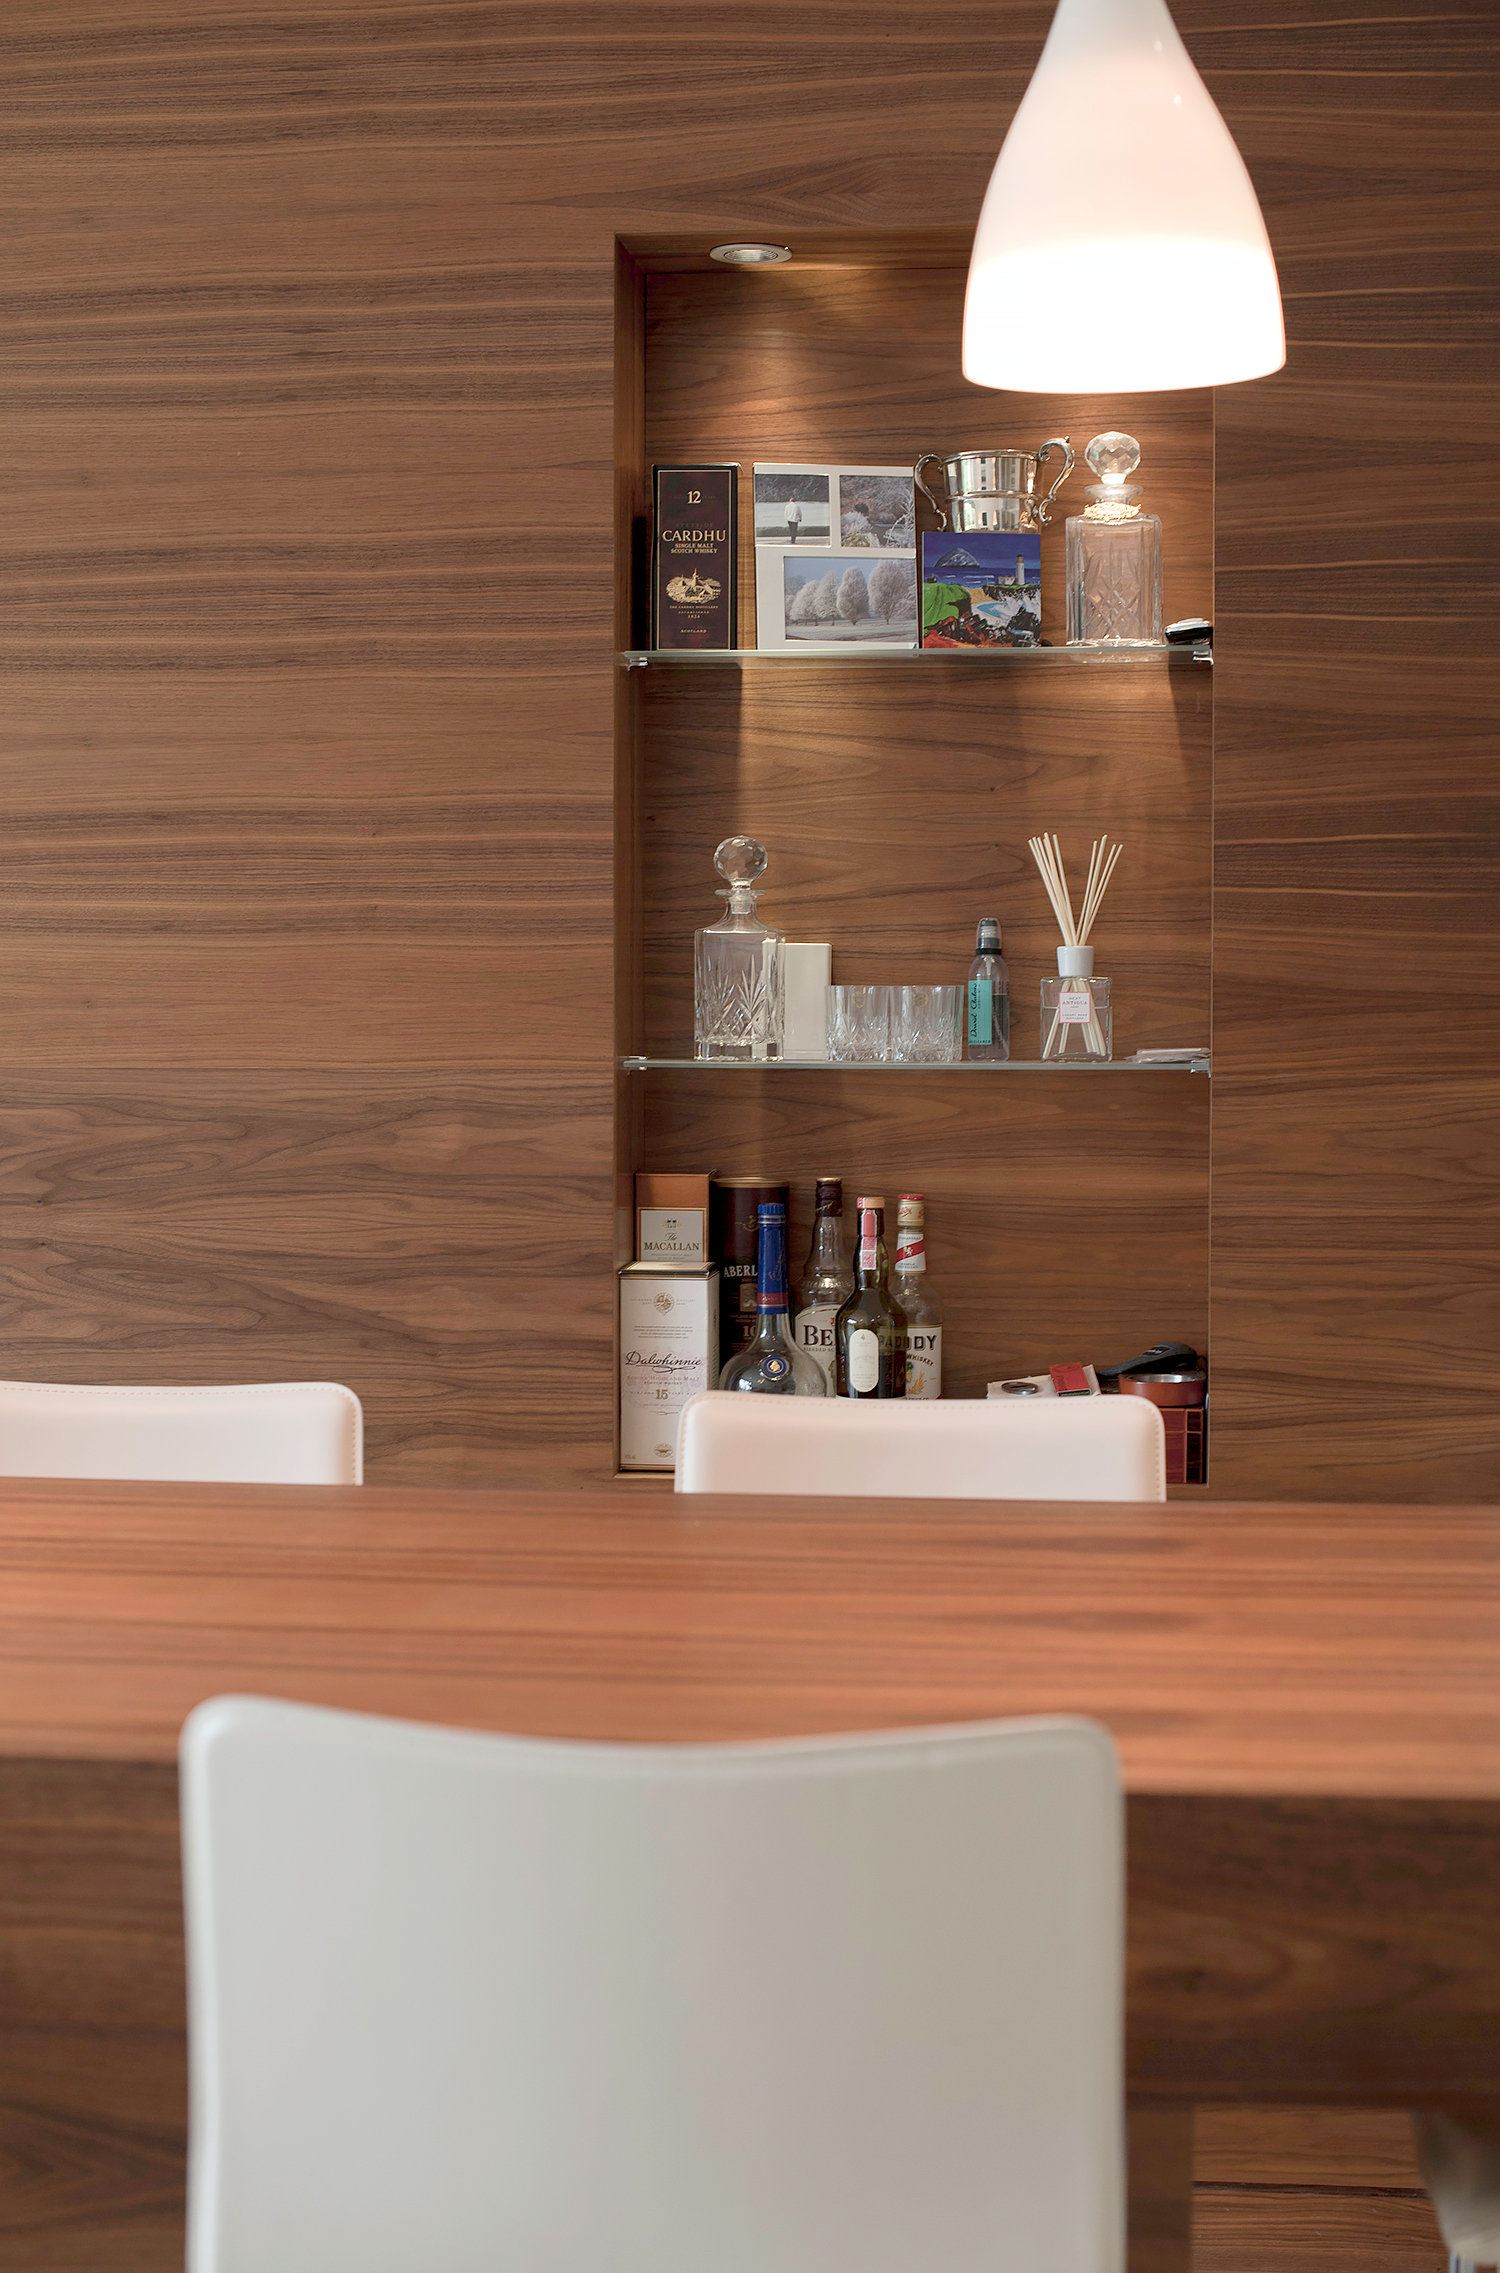 _interior-photography-residential-dorset-mileride-14.jpg